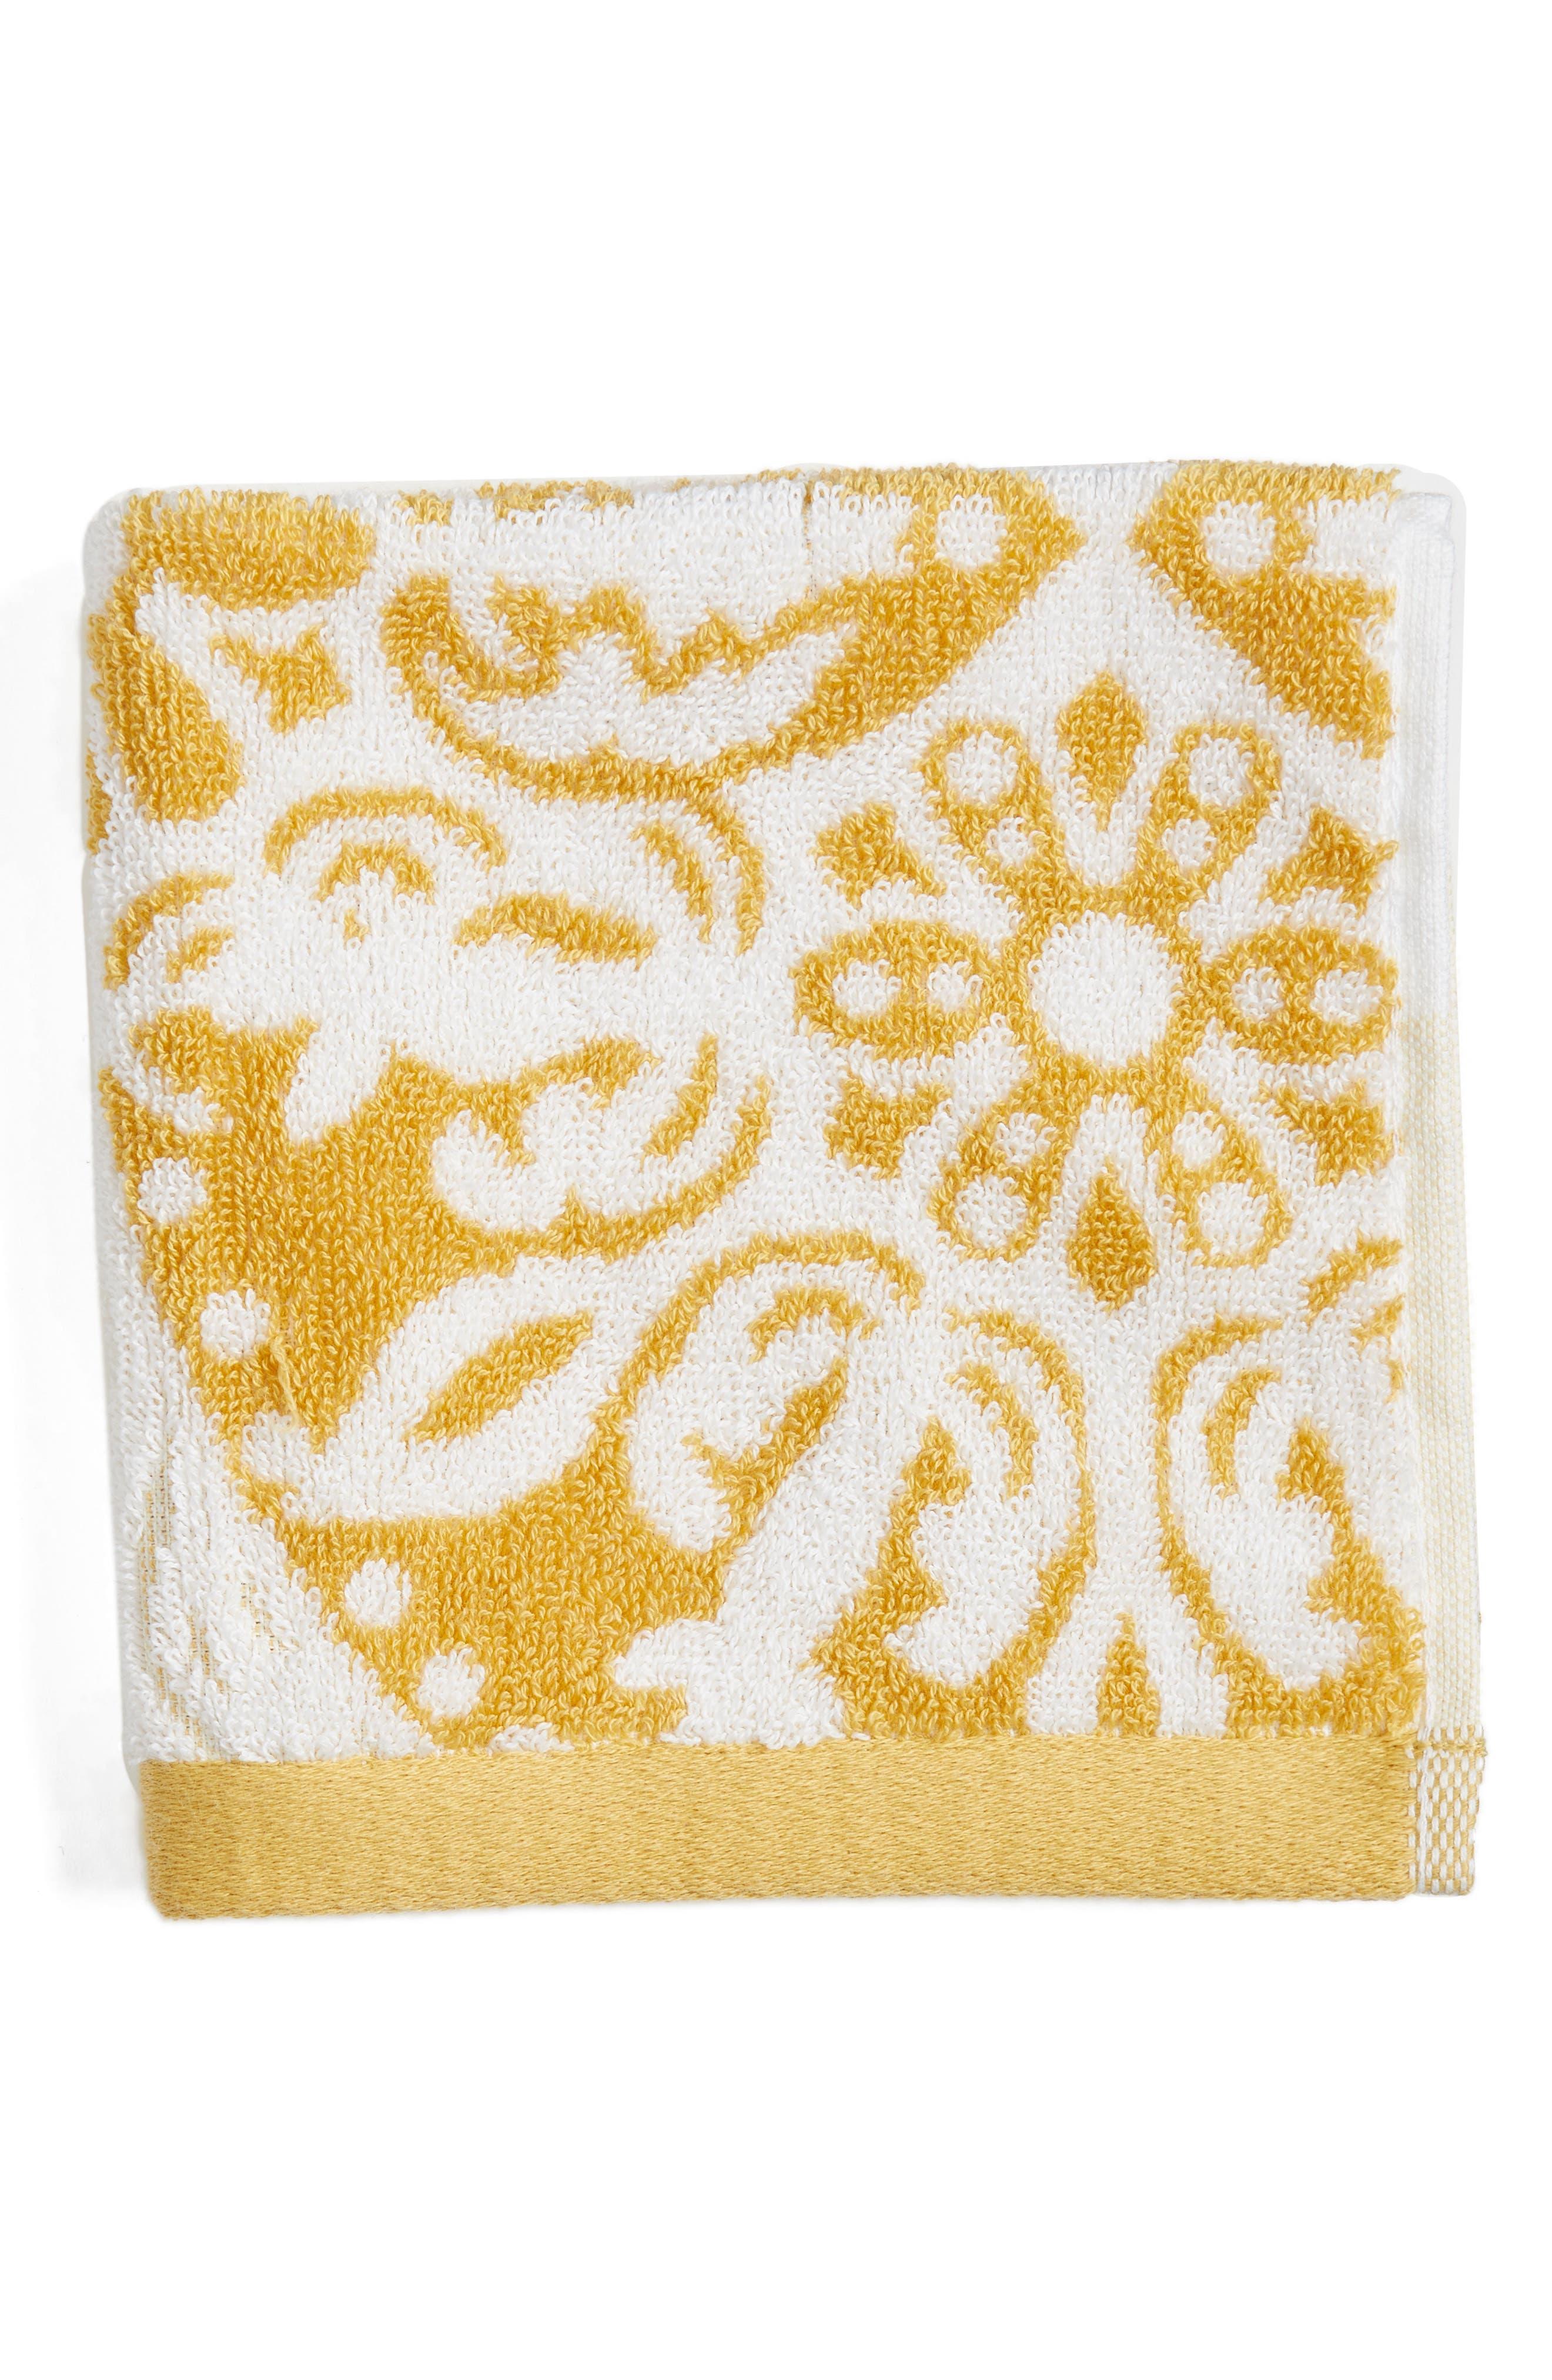 Fan Ombré Washcloth,                             Main thumbnail 1, color,                             Yellow Leaf